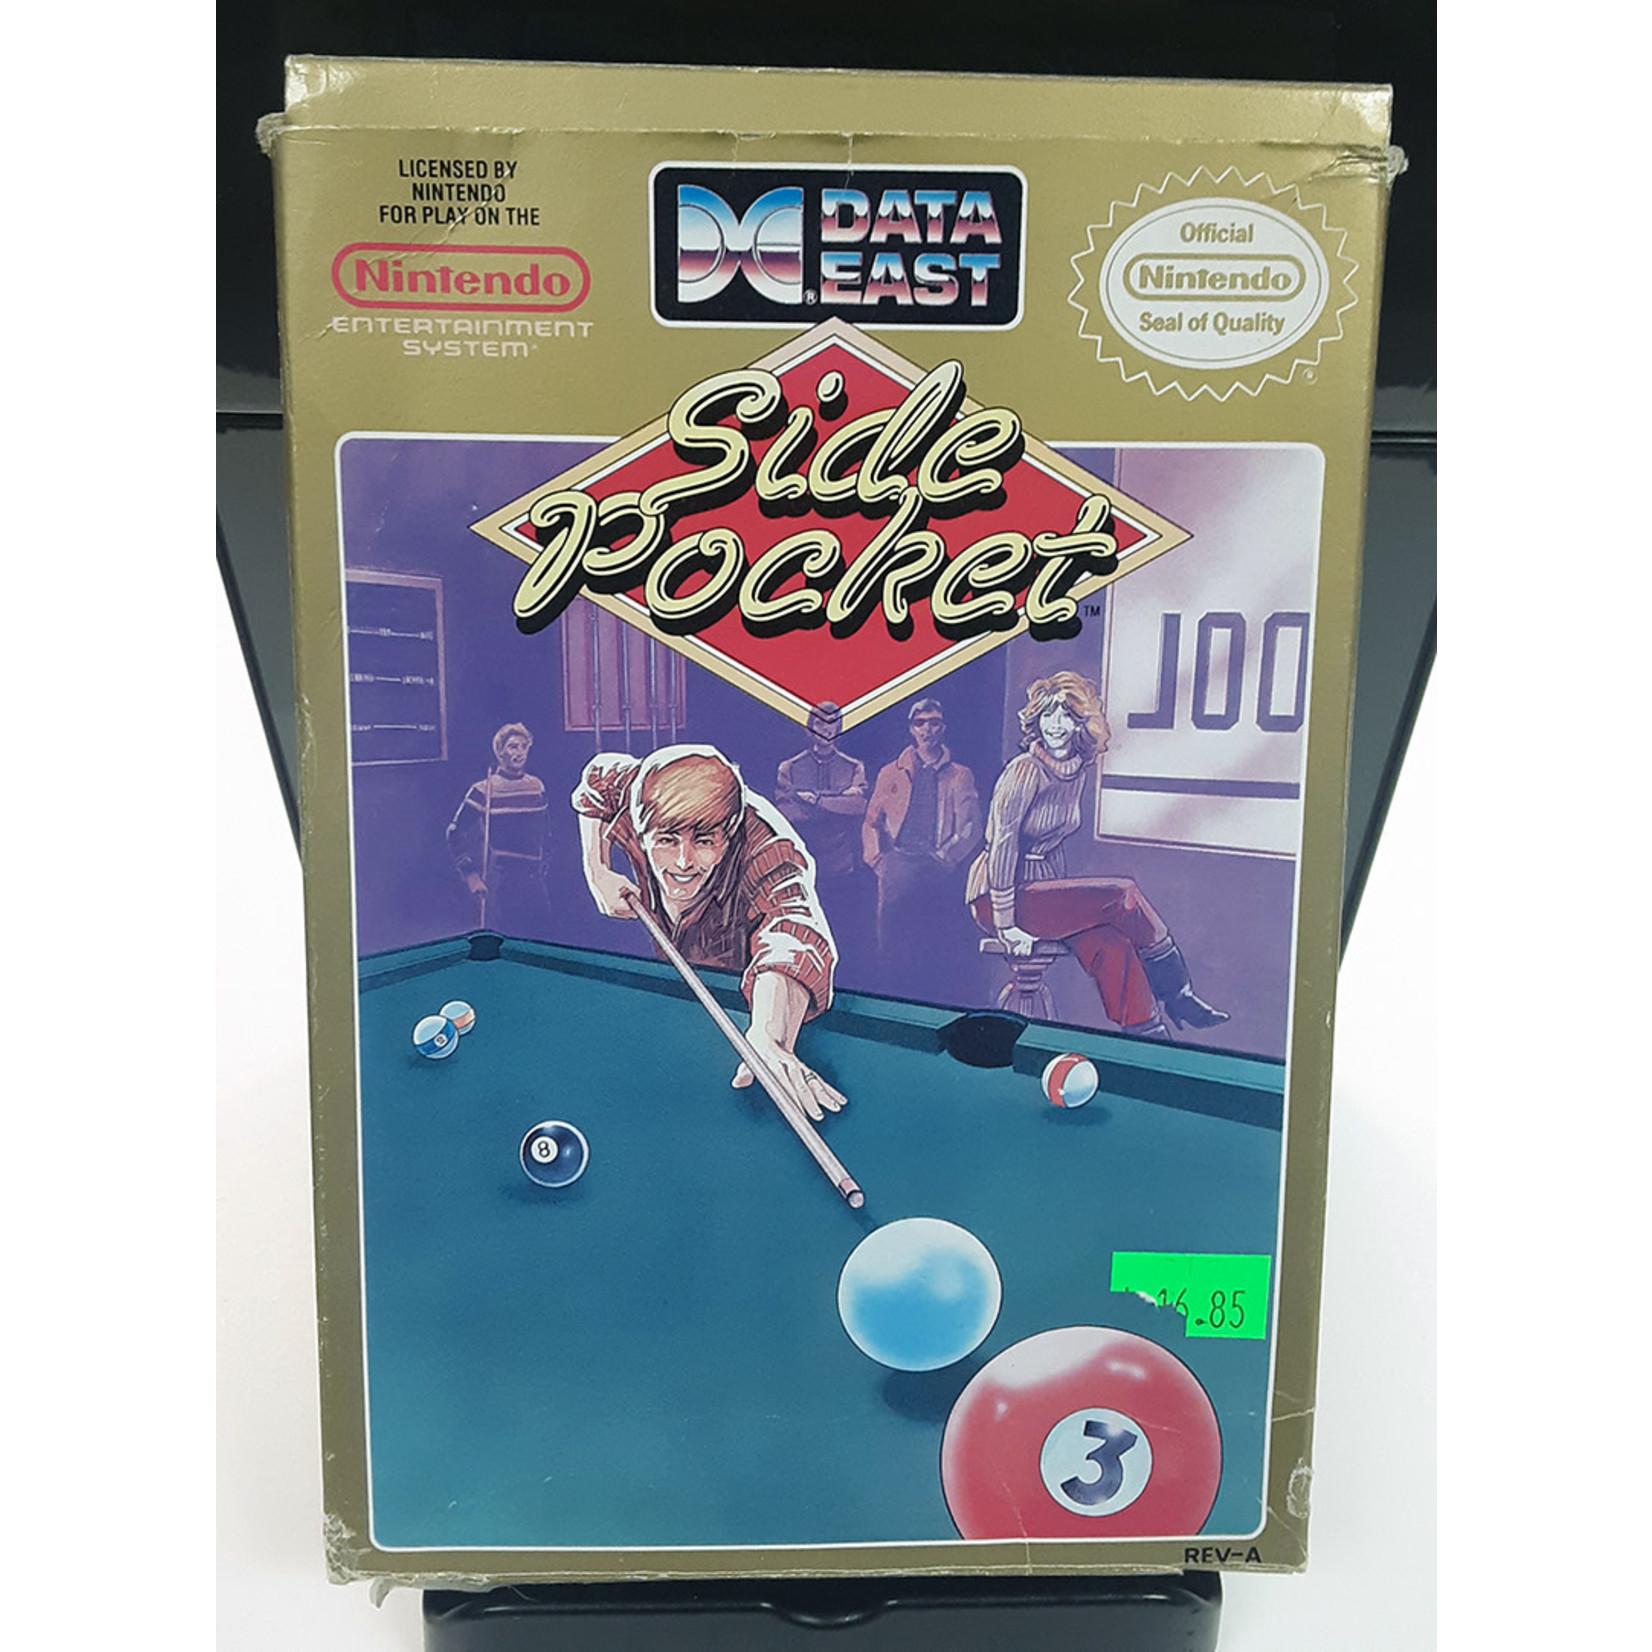 NESU-Side Pocket (in box)